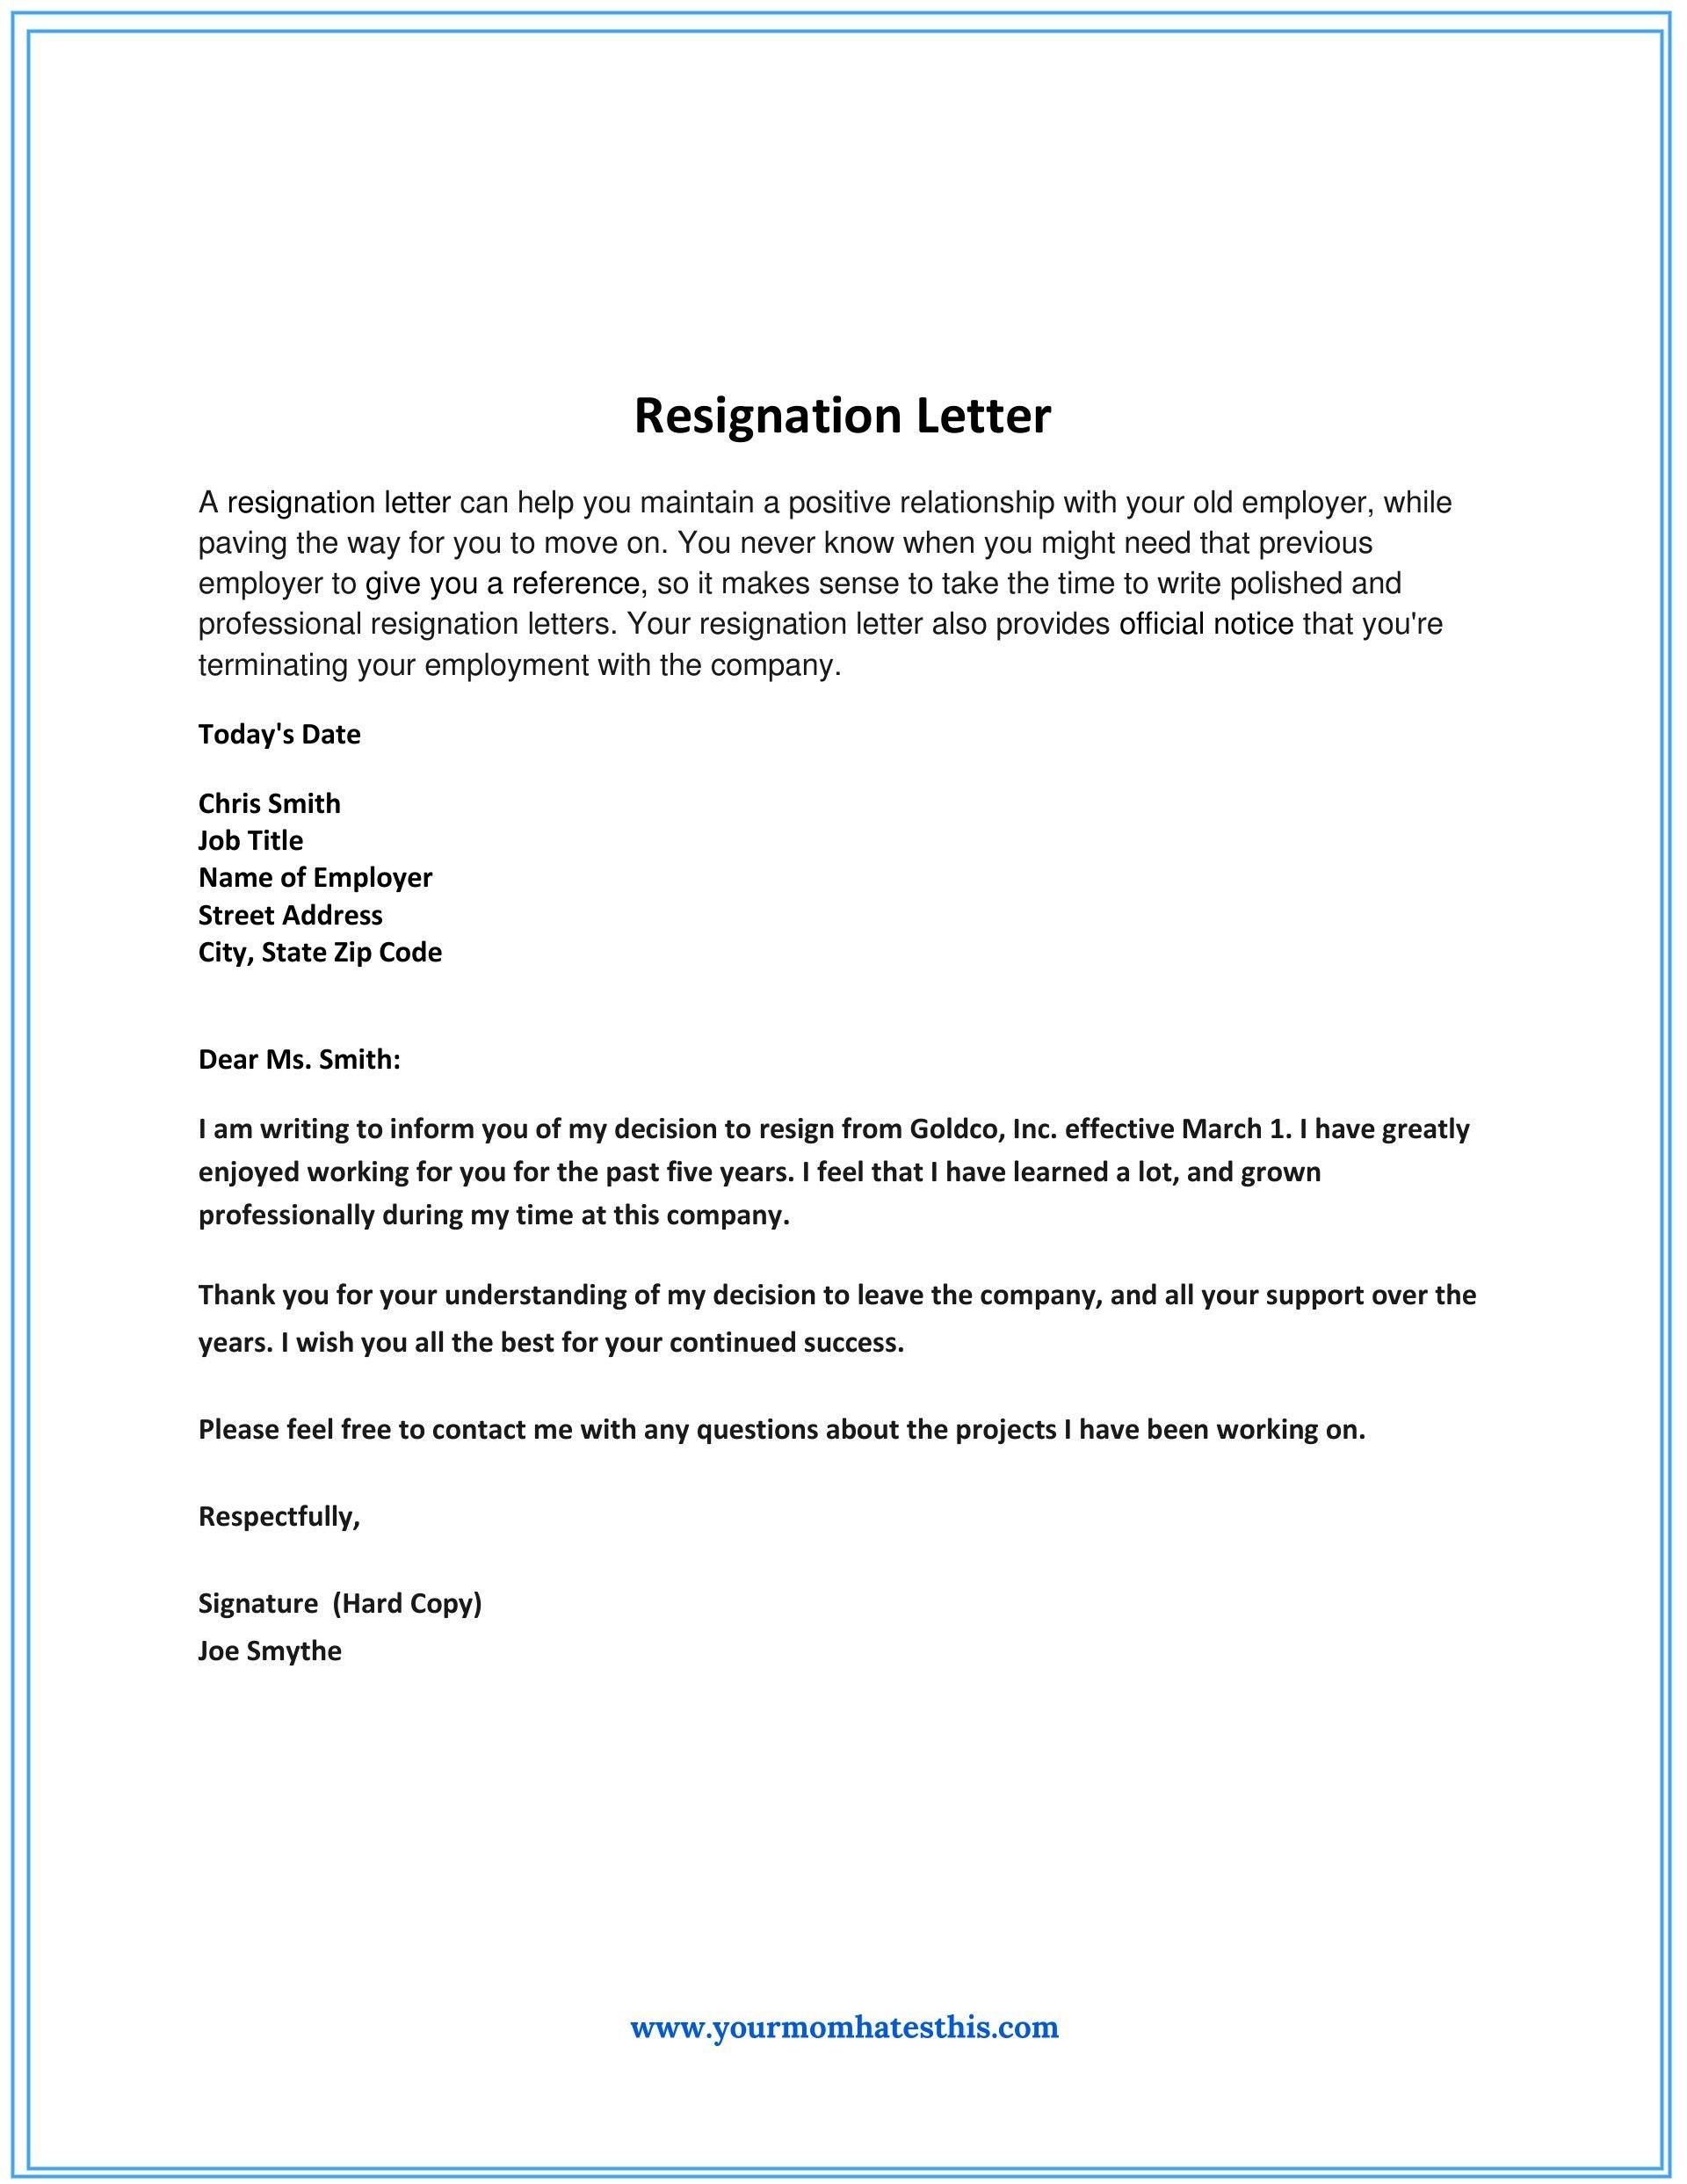 Resignation Letter Gs The Modern Rules Of Resignation